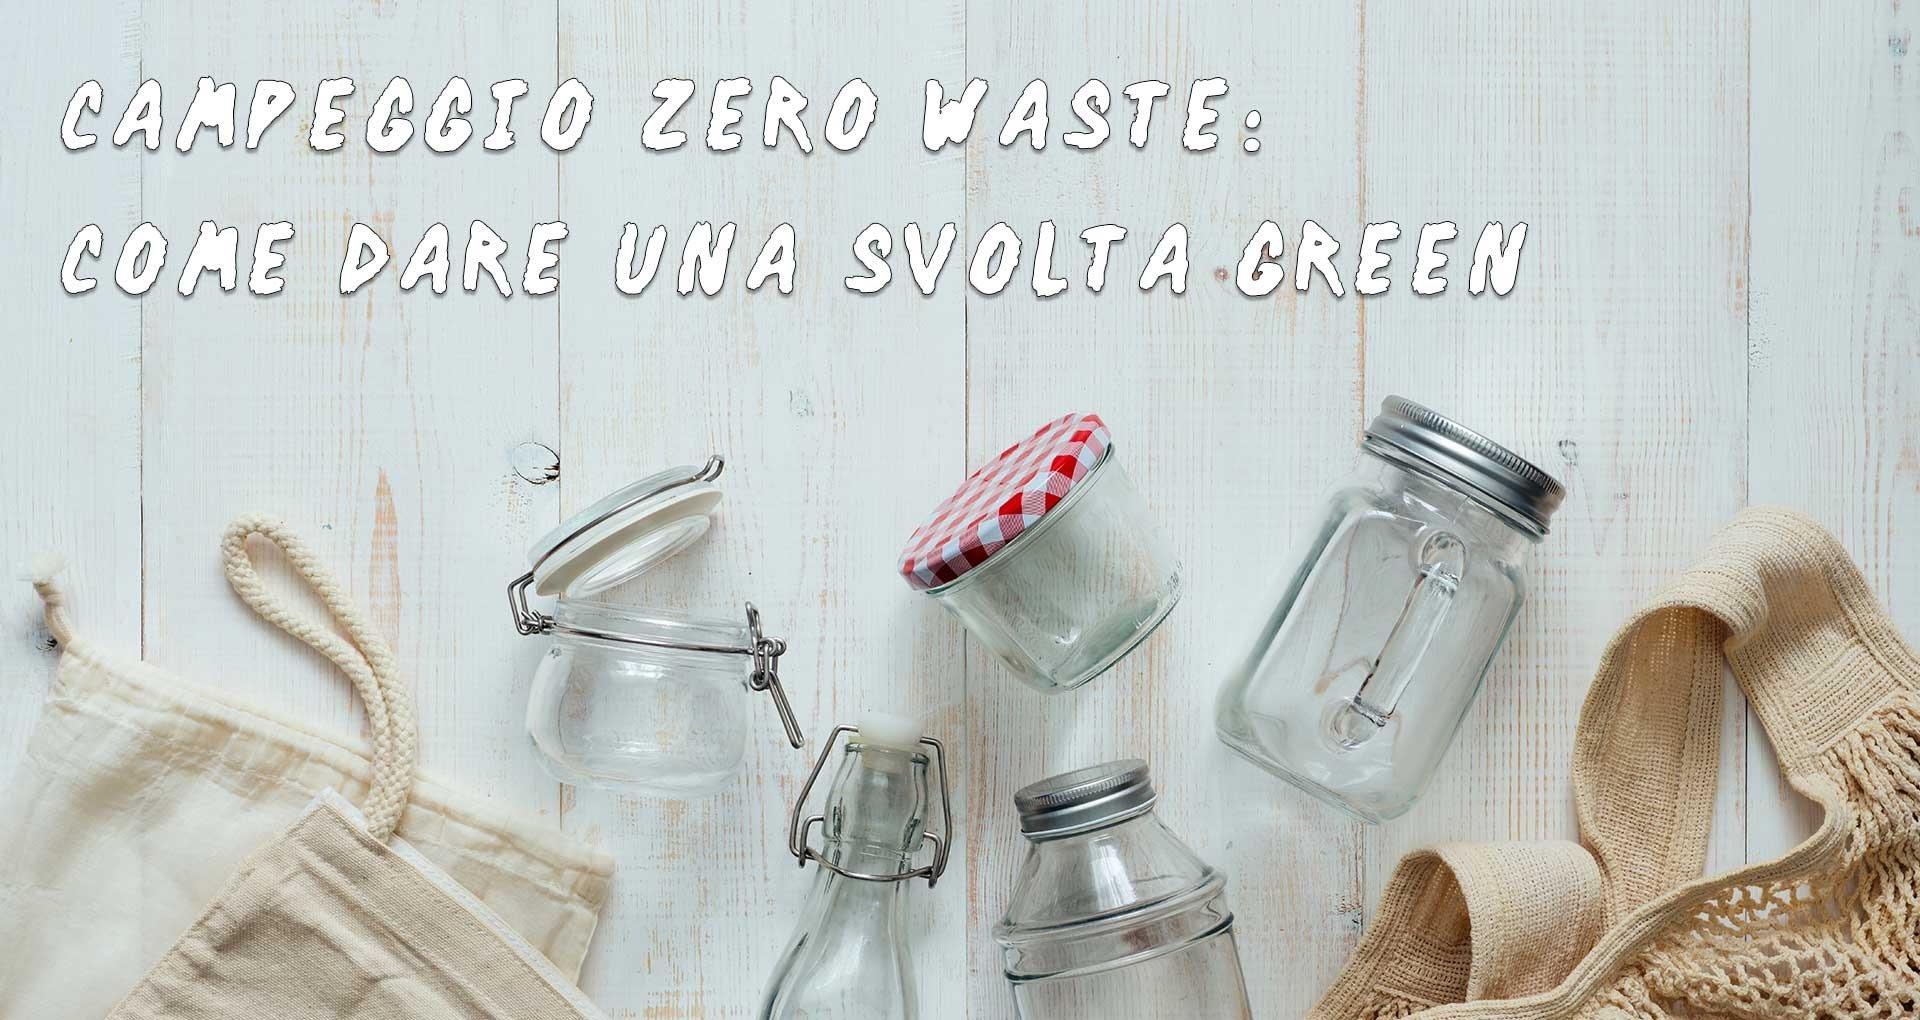 Eco camping Zero waste